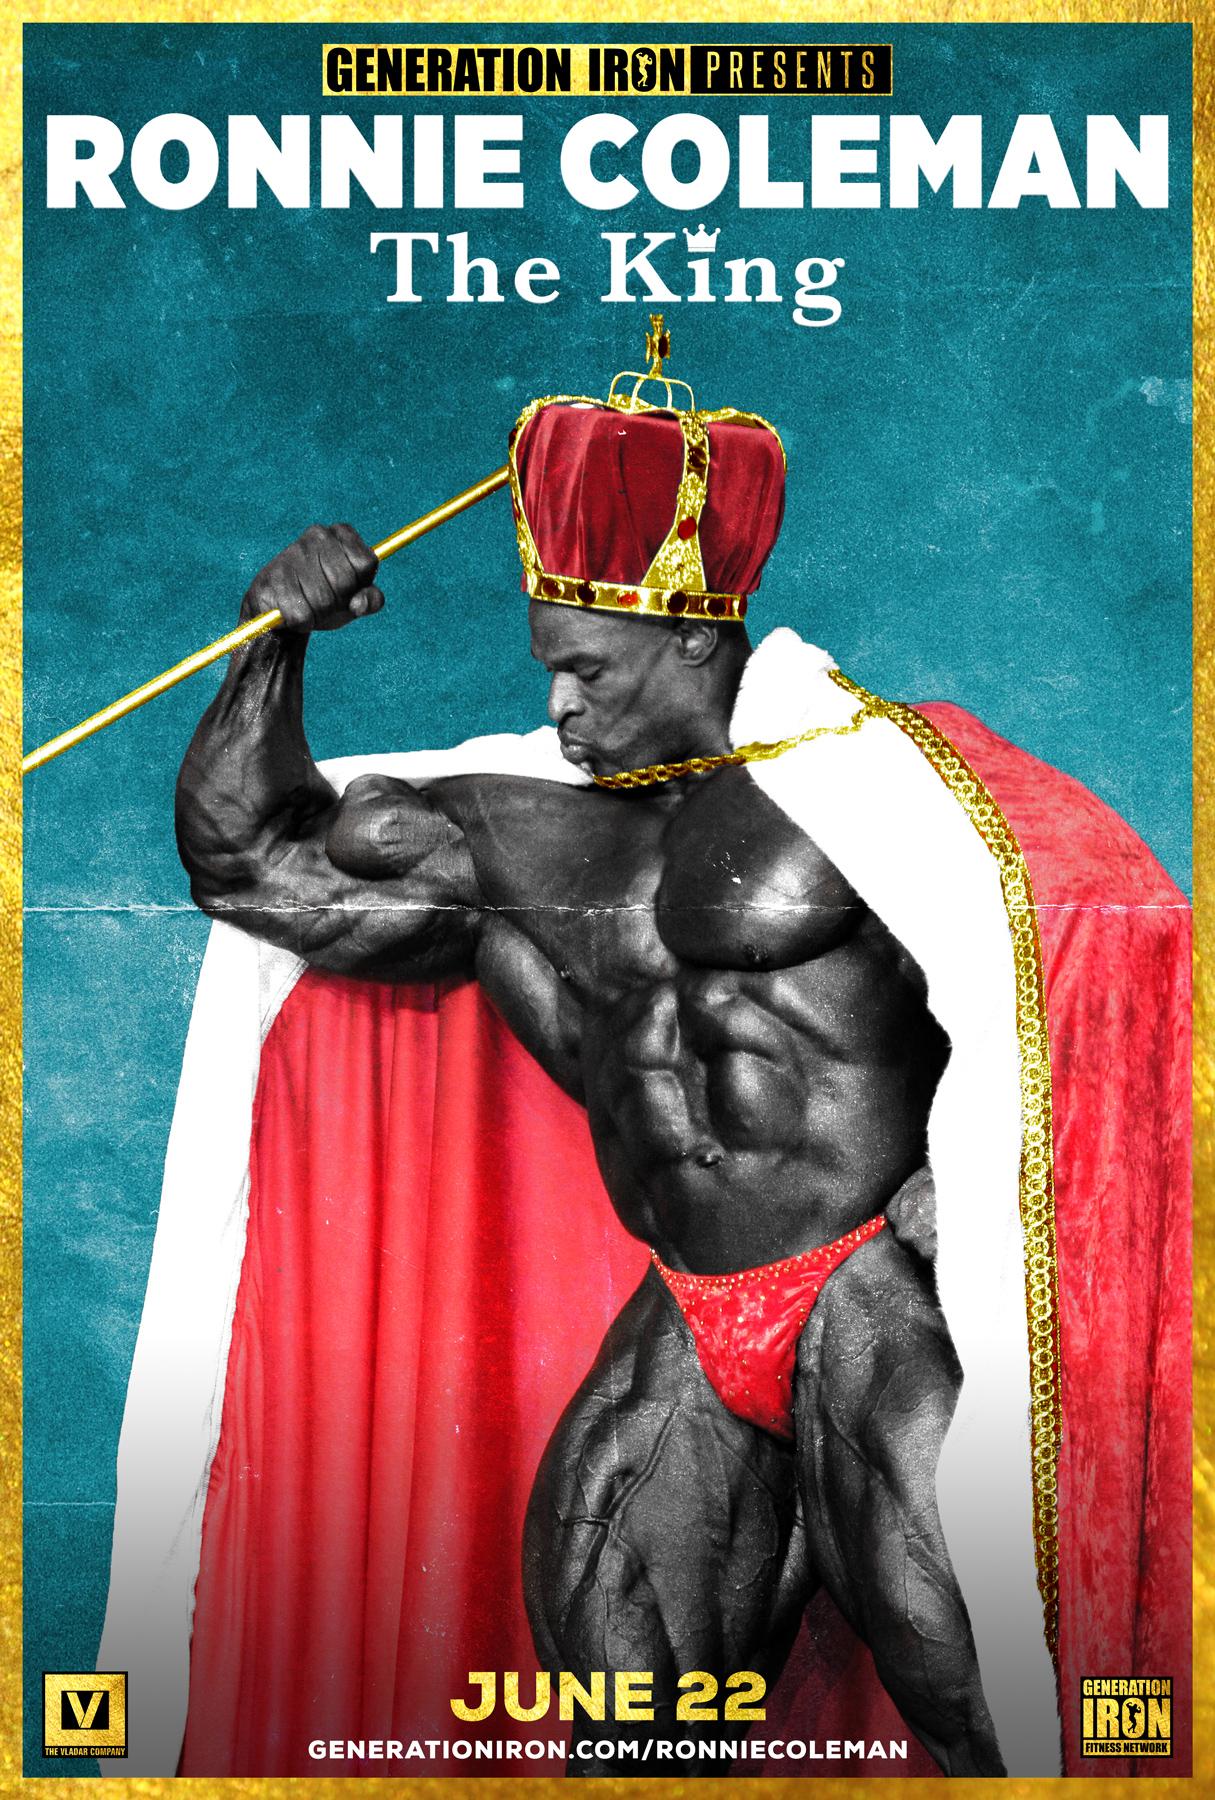 bb4df5d5686 Ronnie Coleman  The King (2018) - IMDb